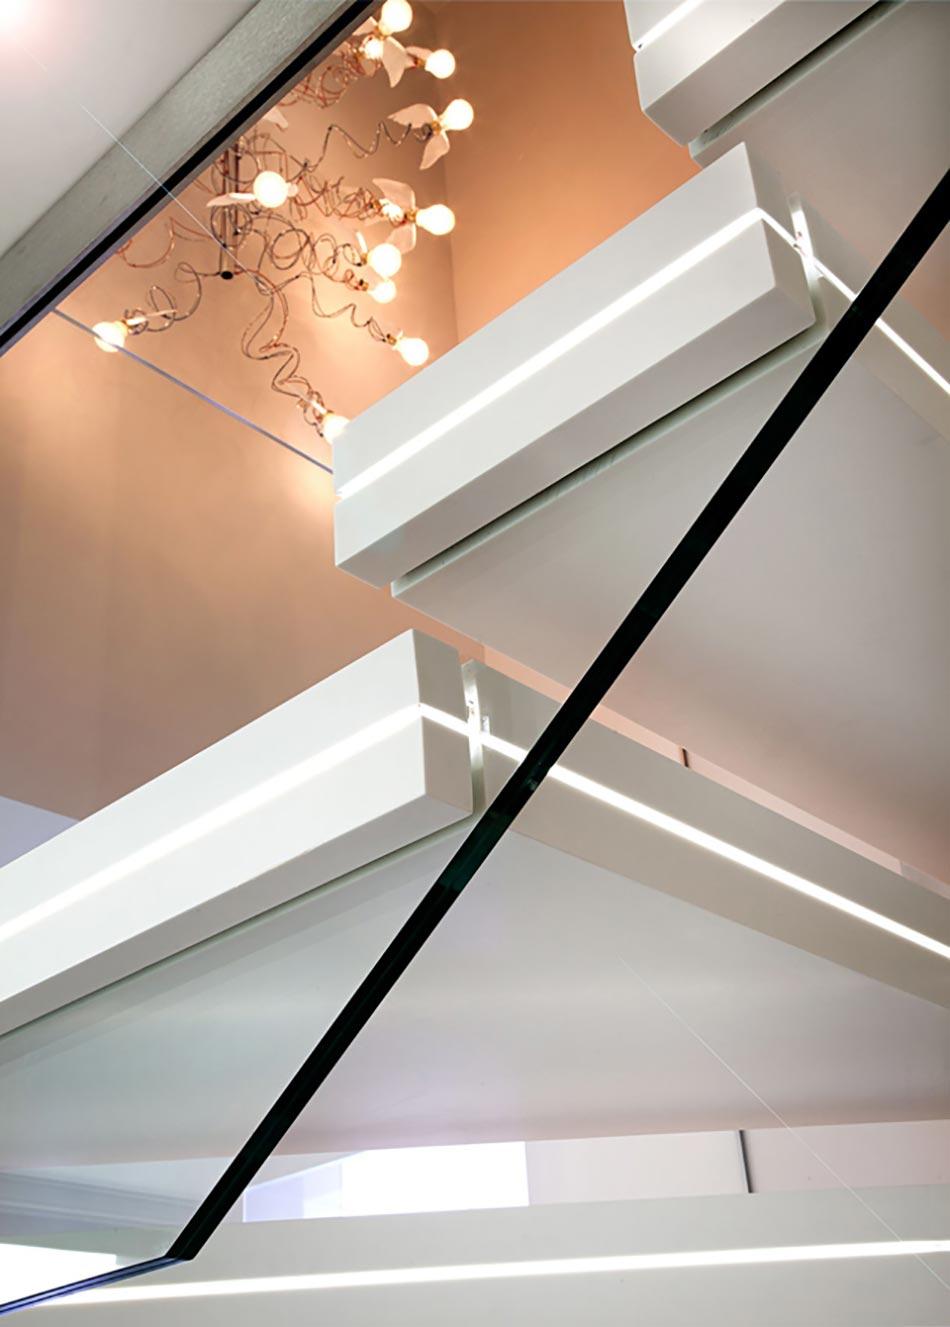 escalier design lumineux par luxio design feria. Black Bedroom Furniture Sets. Home Design Ideas